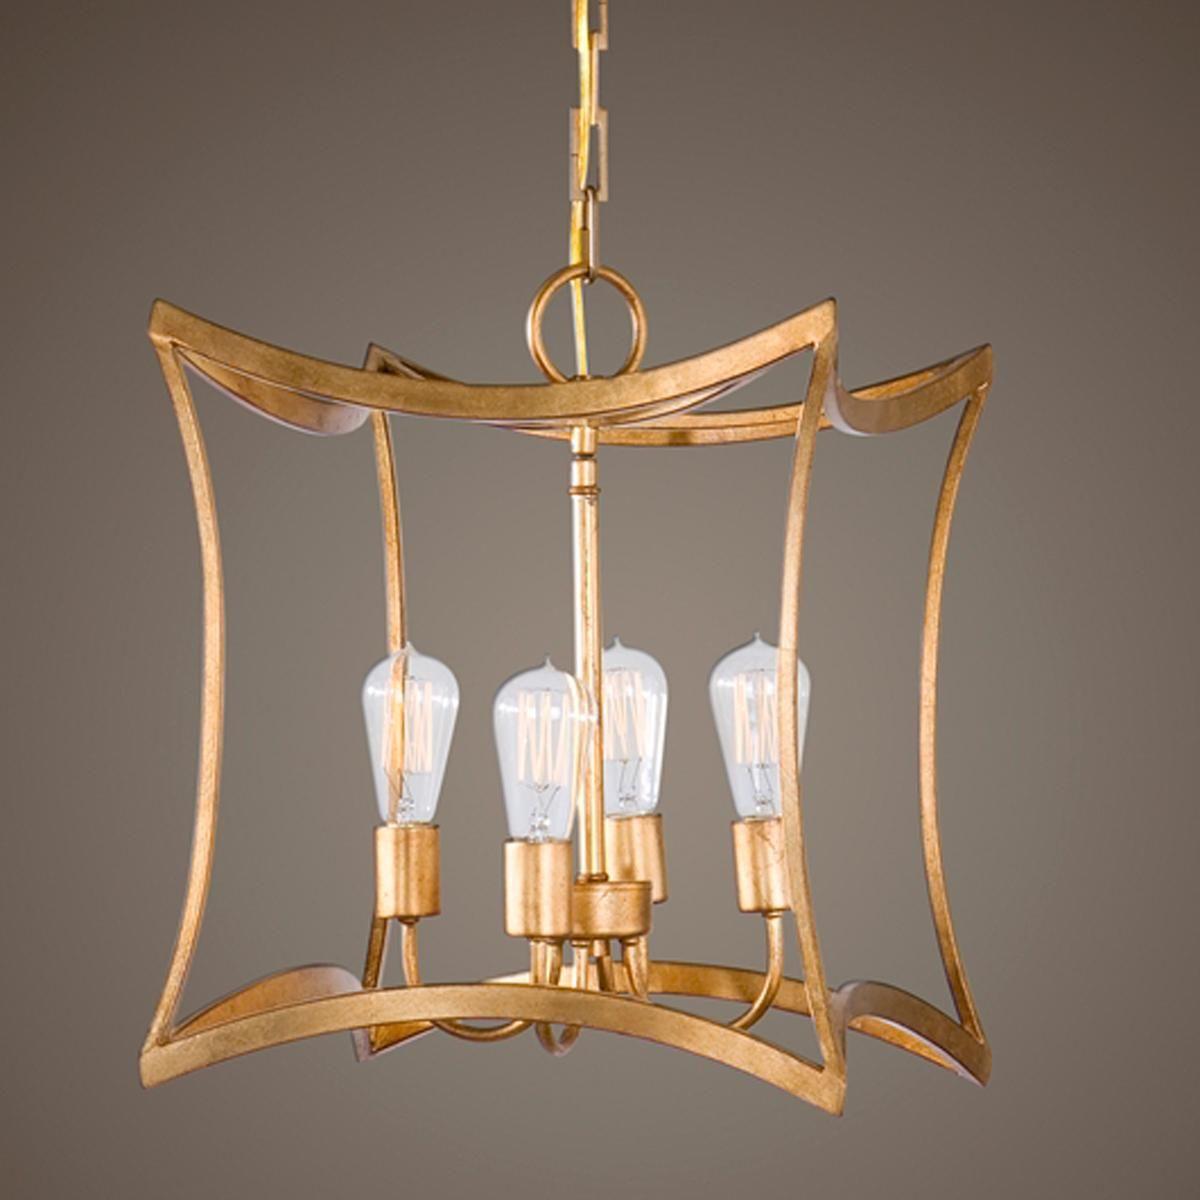 Elegant Gold Leaf Square Lantern Ceiling Pendant Lights Pendant Light Fixtures Lantern Pendant Ceiling pendant light fixtures